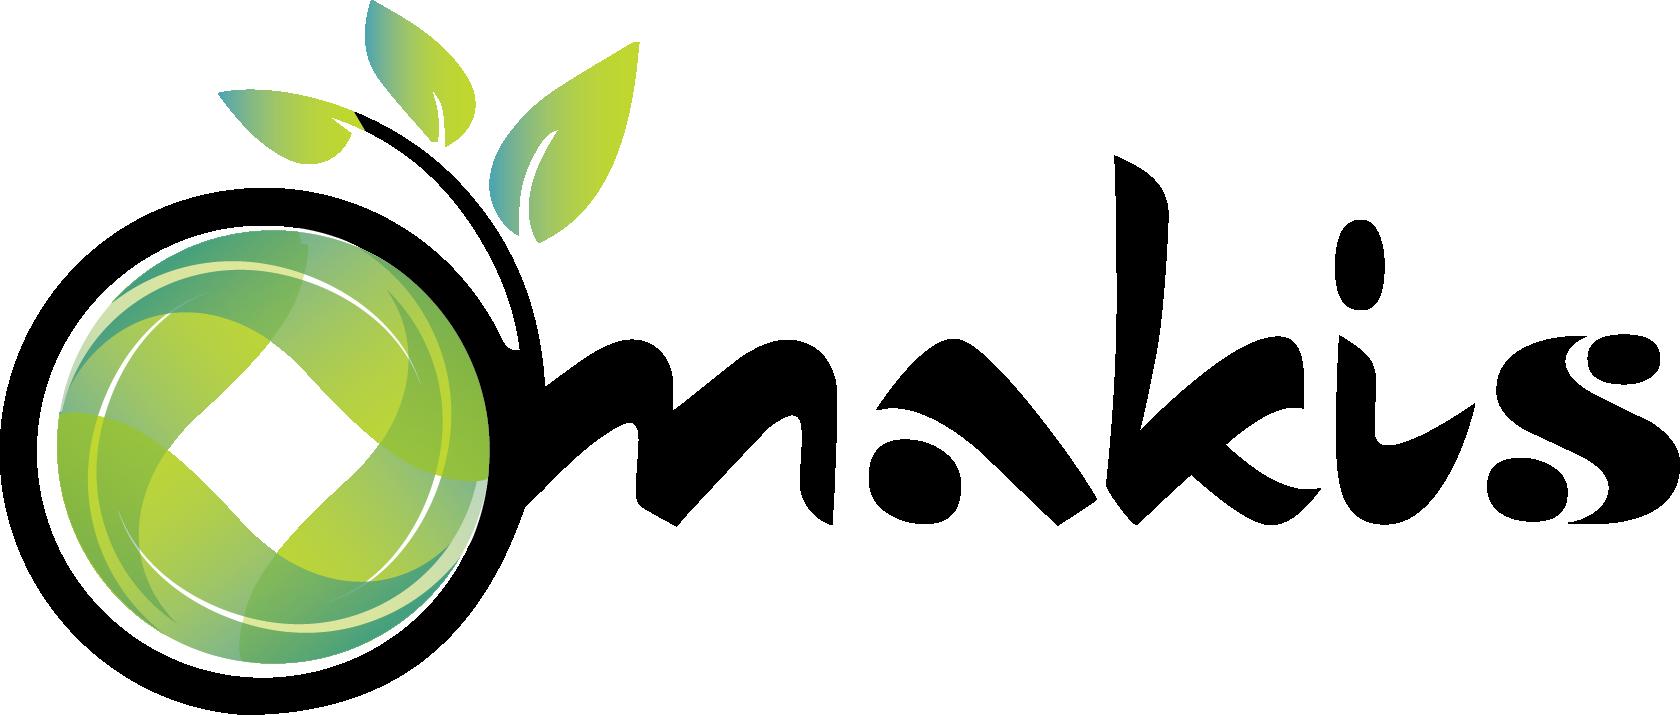 Omakis.vn - Hạt dinh dưỡng